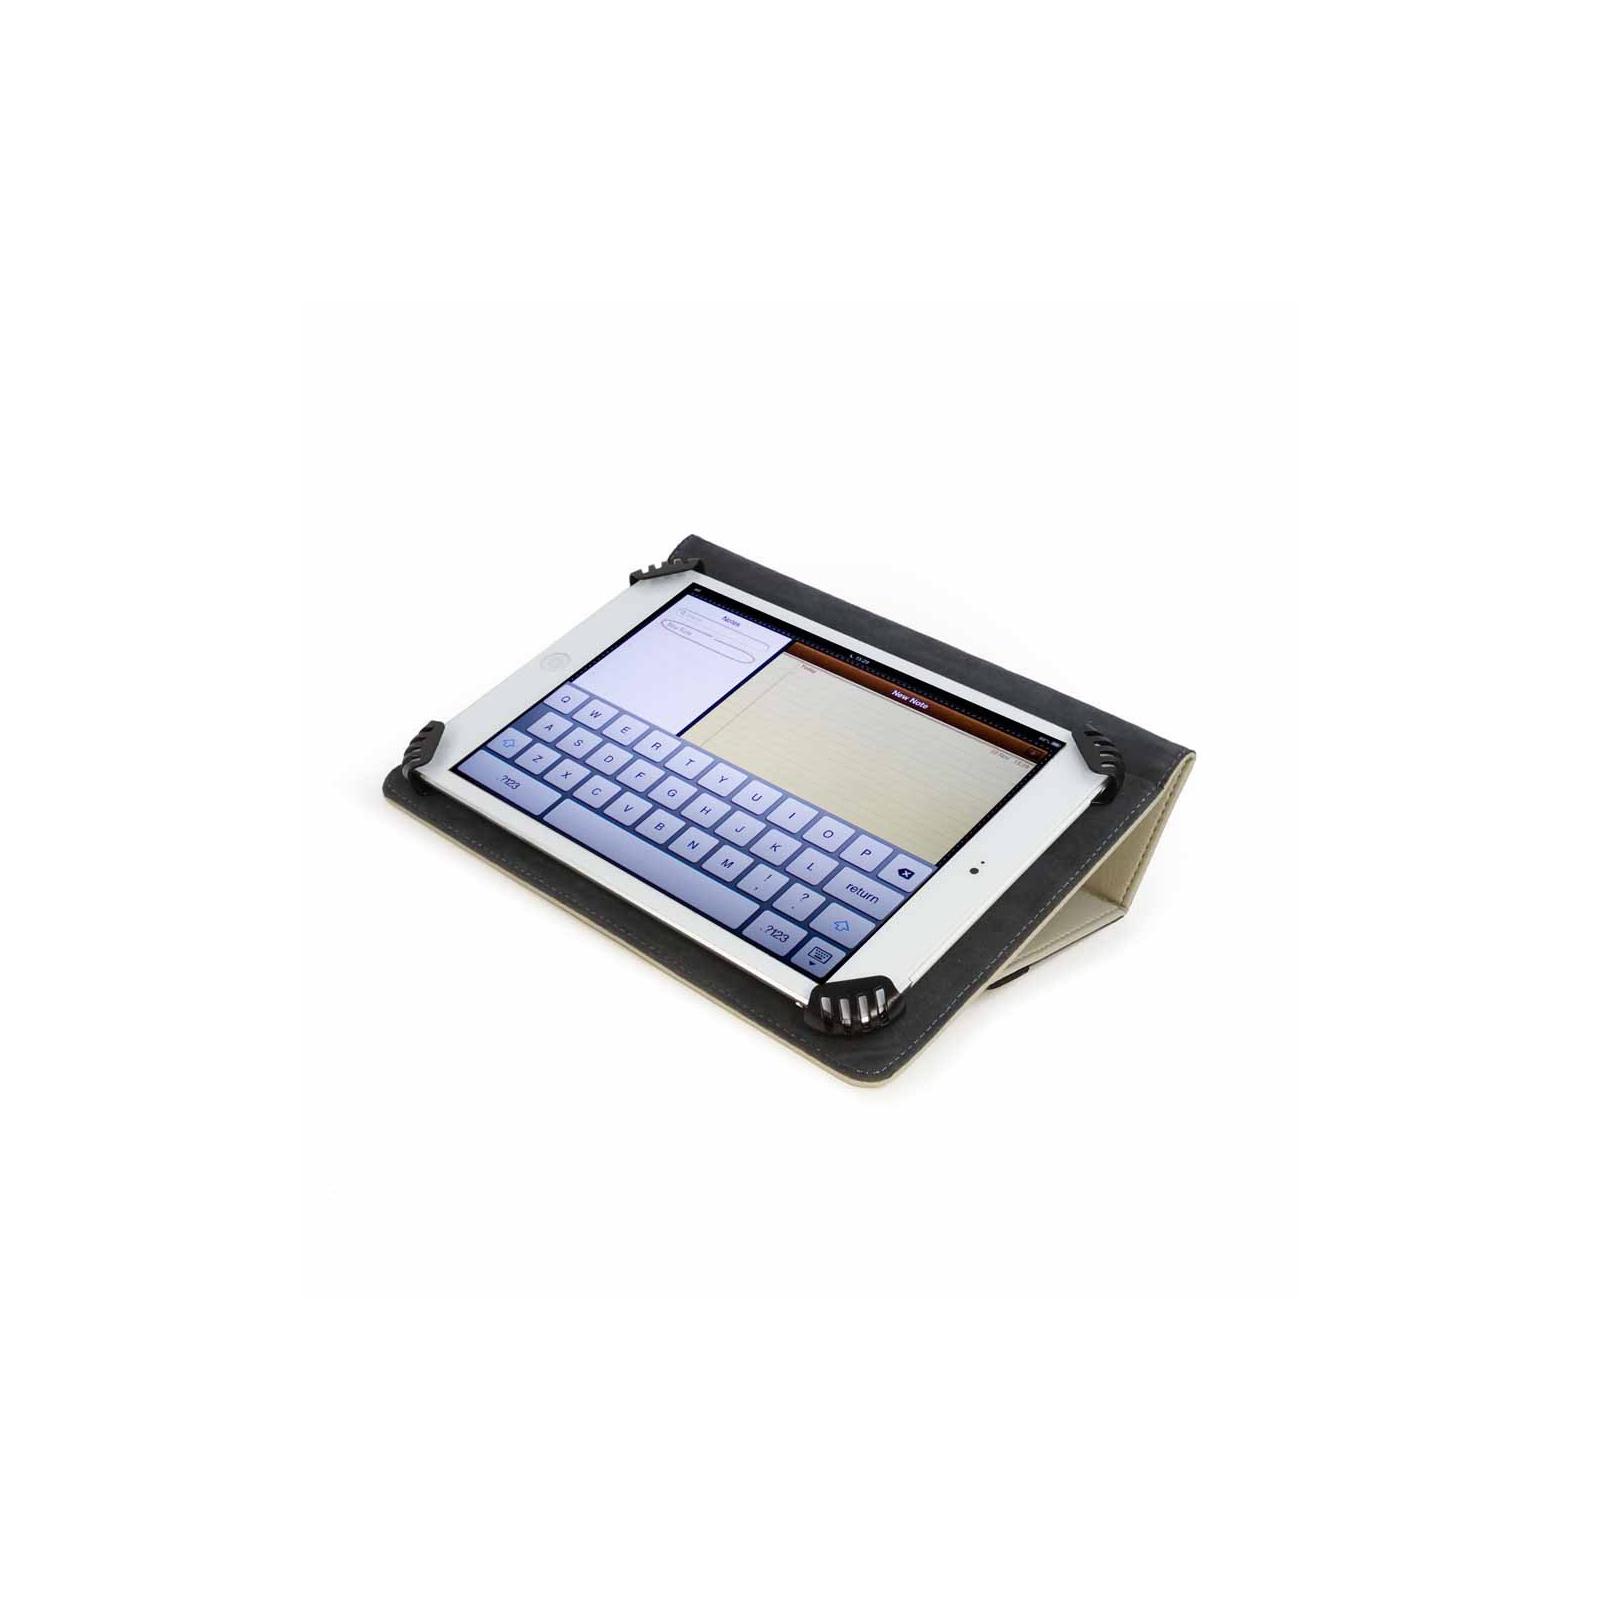 Чехол для планшета Tuff-Luv 7 Uni-View Gray (A3_42) изображение 4